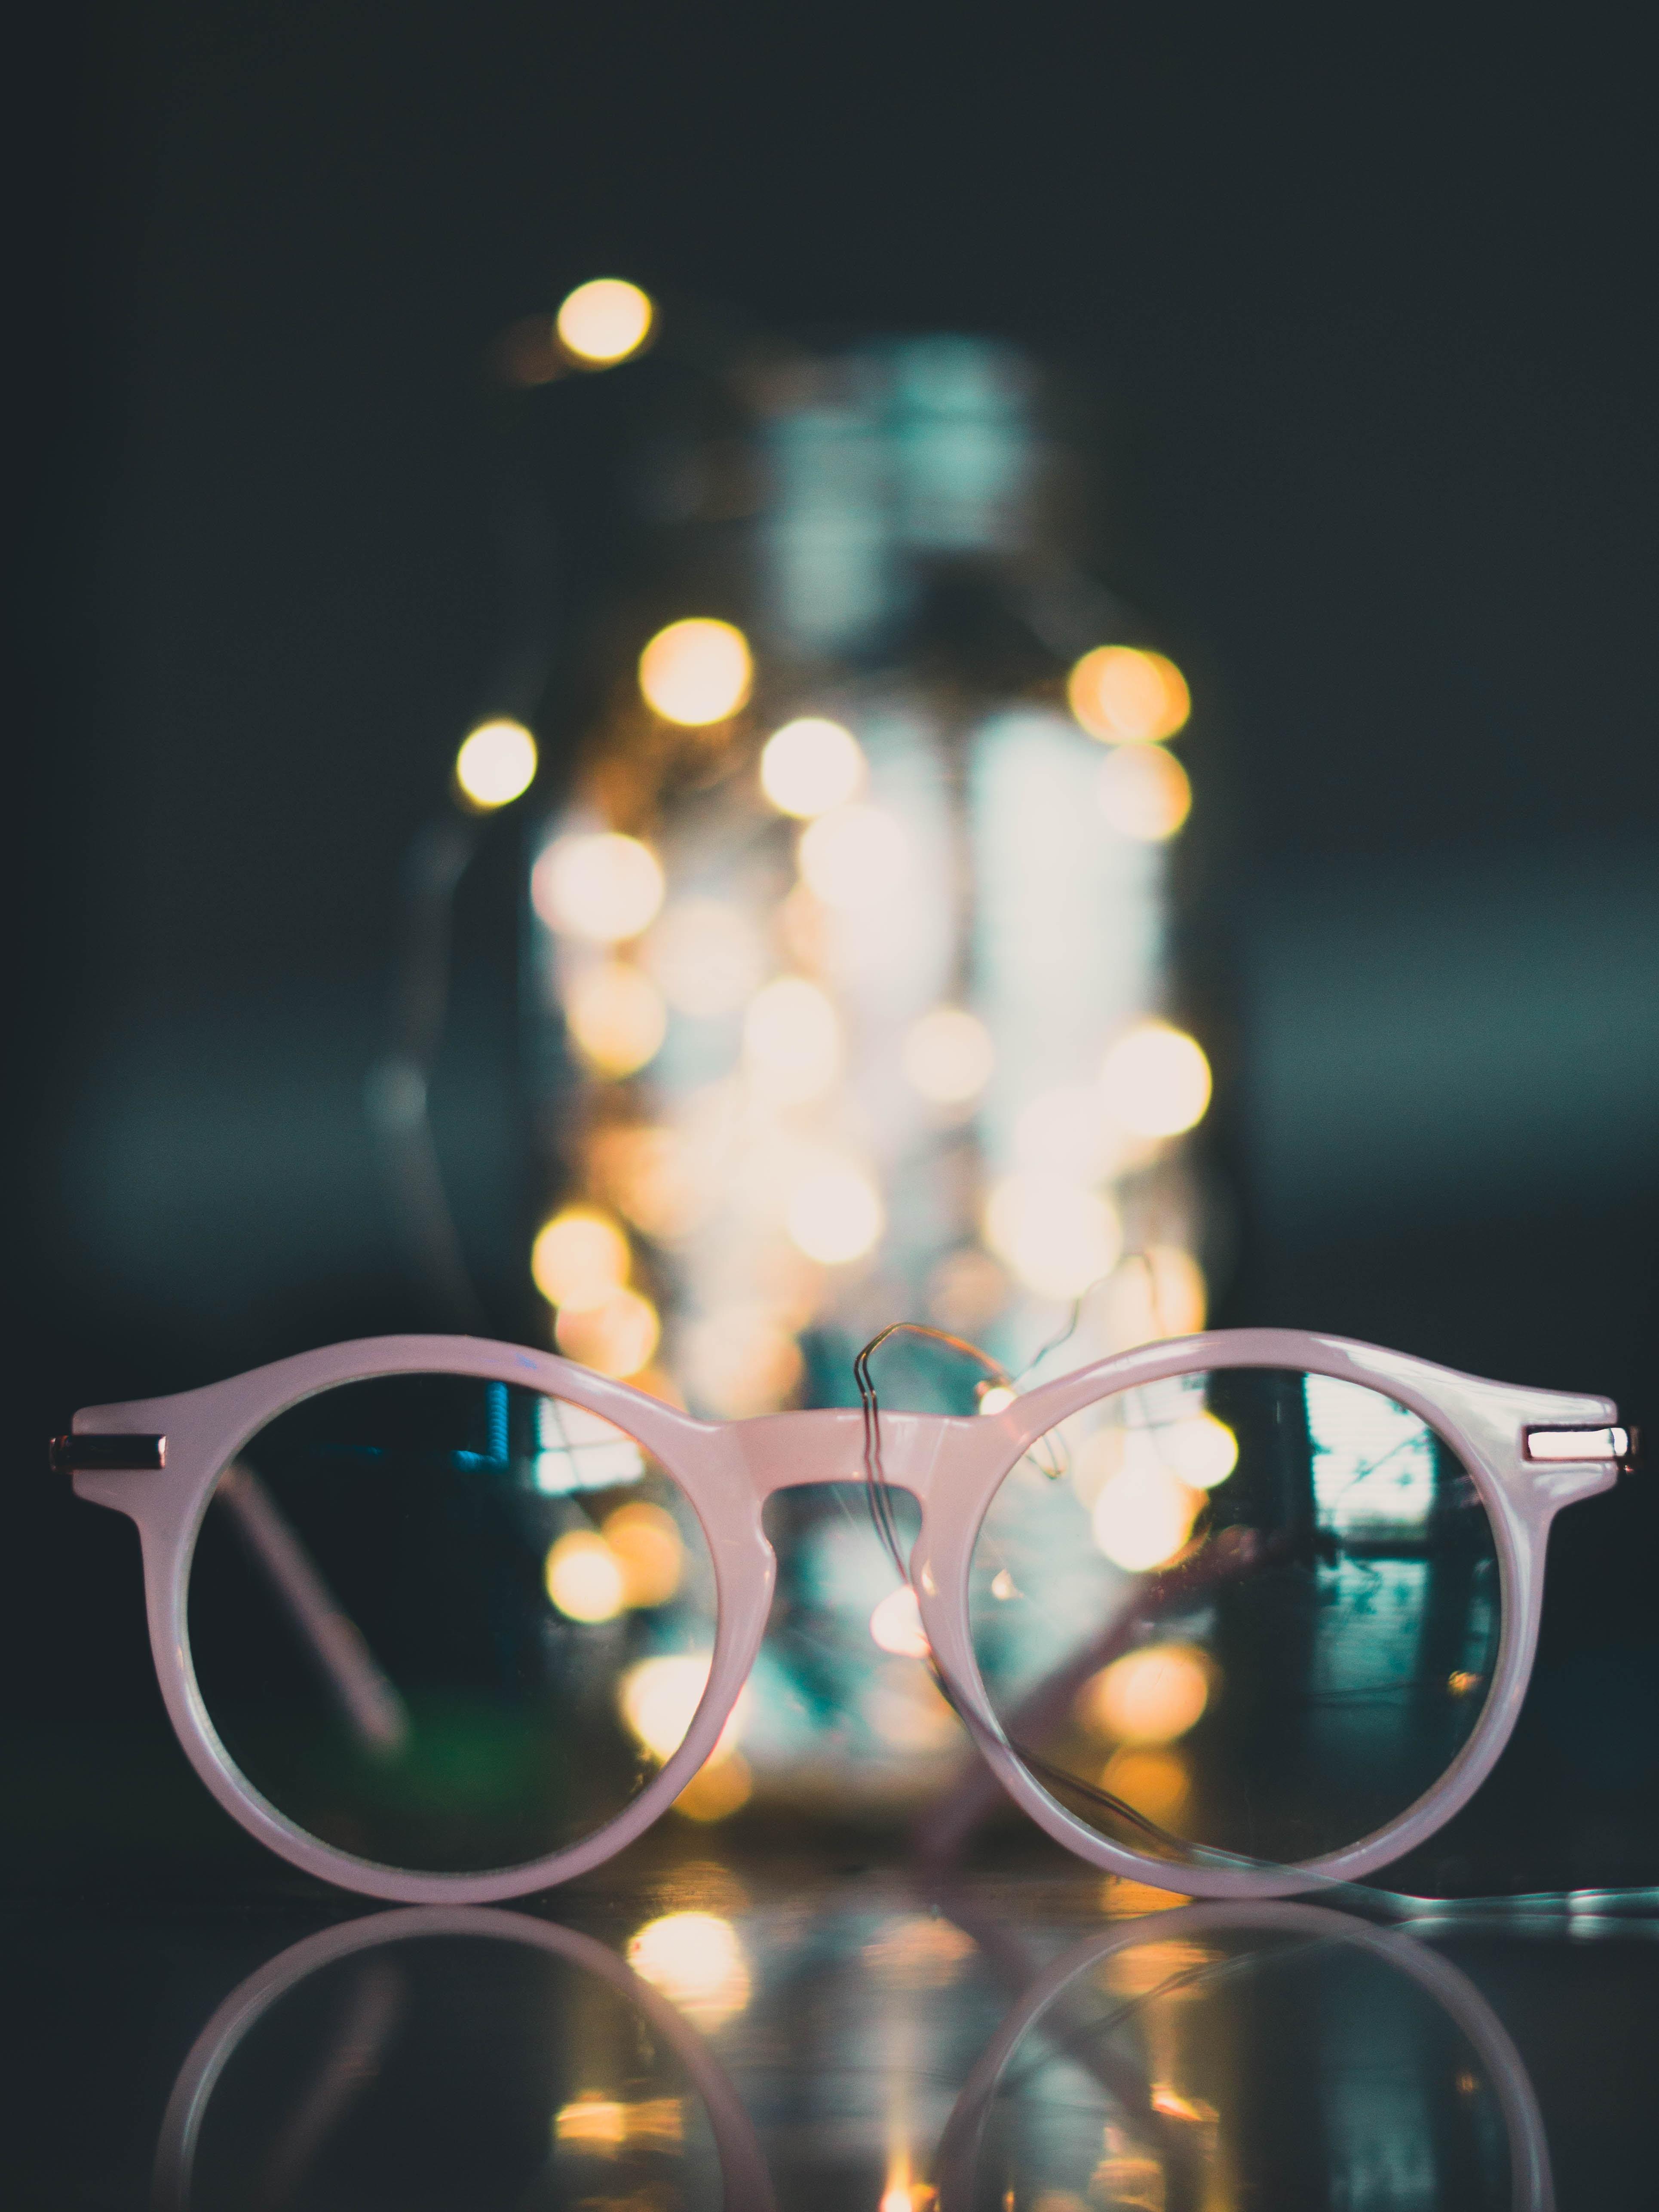 gray framed eyeglasses near glass jar